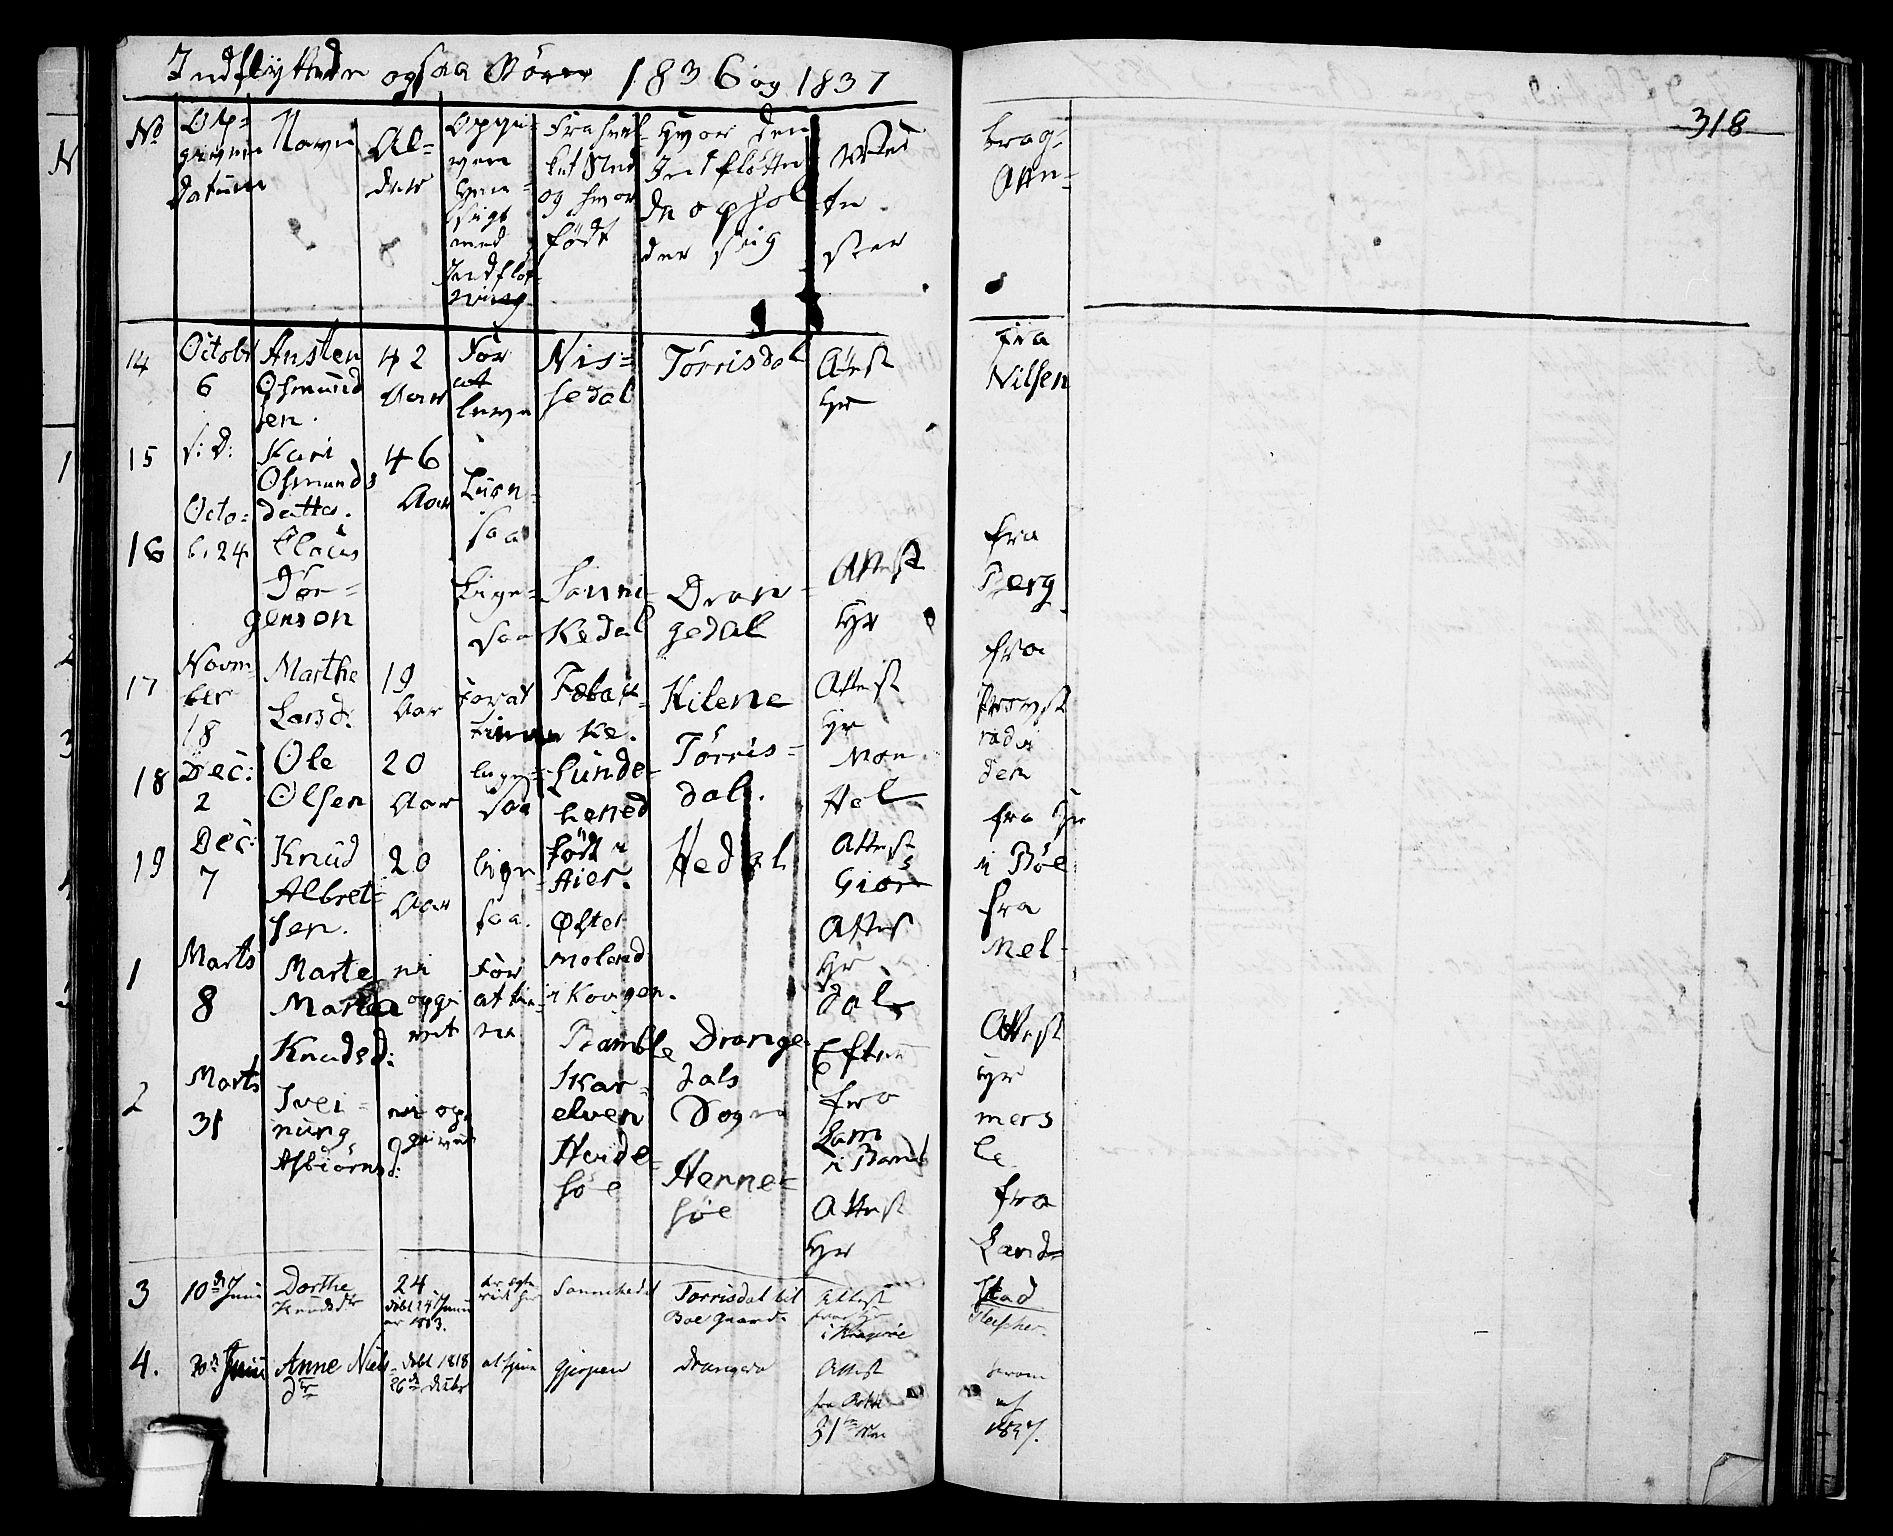 SAKO, Drangedal kirkebøker, F/Fa/L0006: Ministerialbok nr. 6, 1831-1837, s. 318